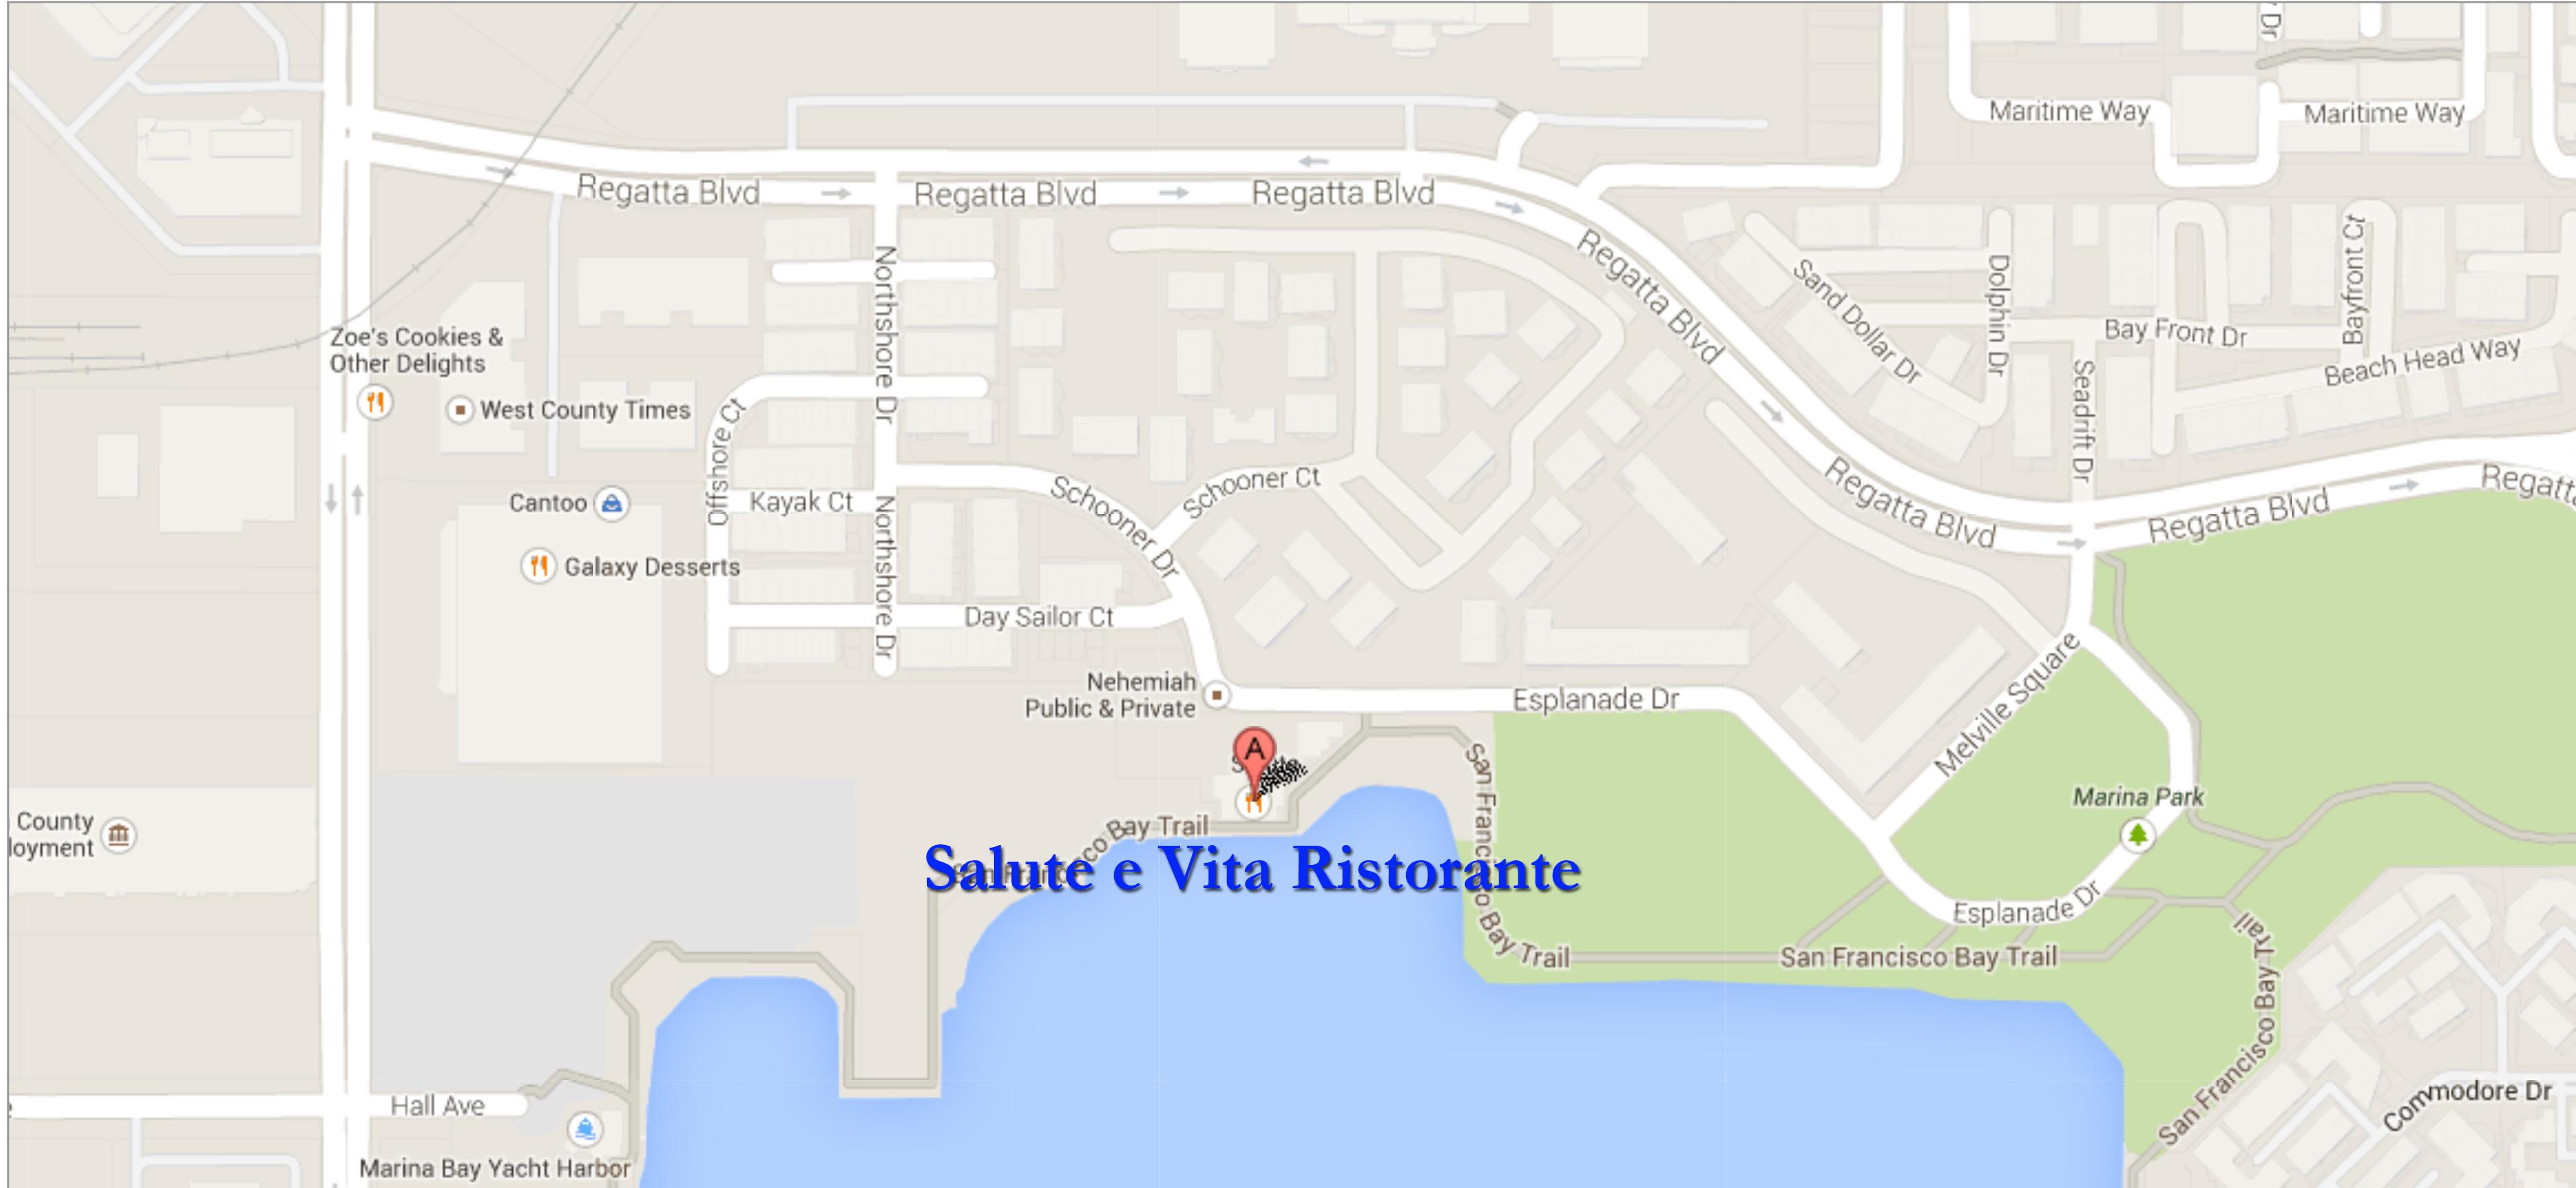 Salute_e_Vita_Rstorante.jpg